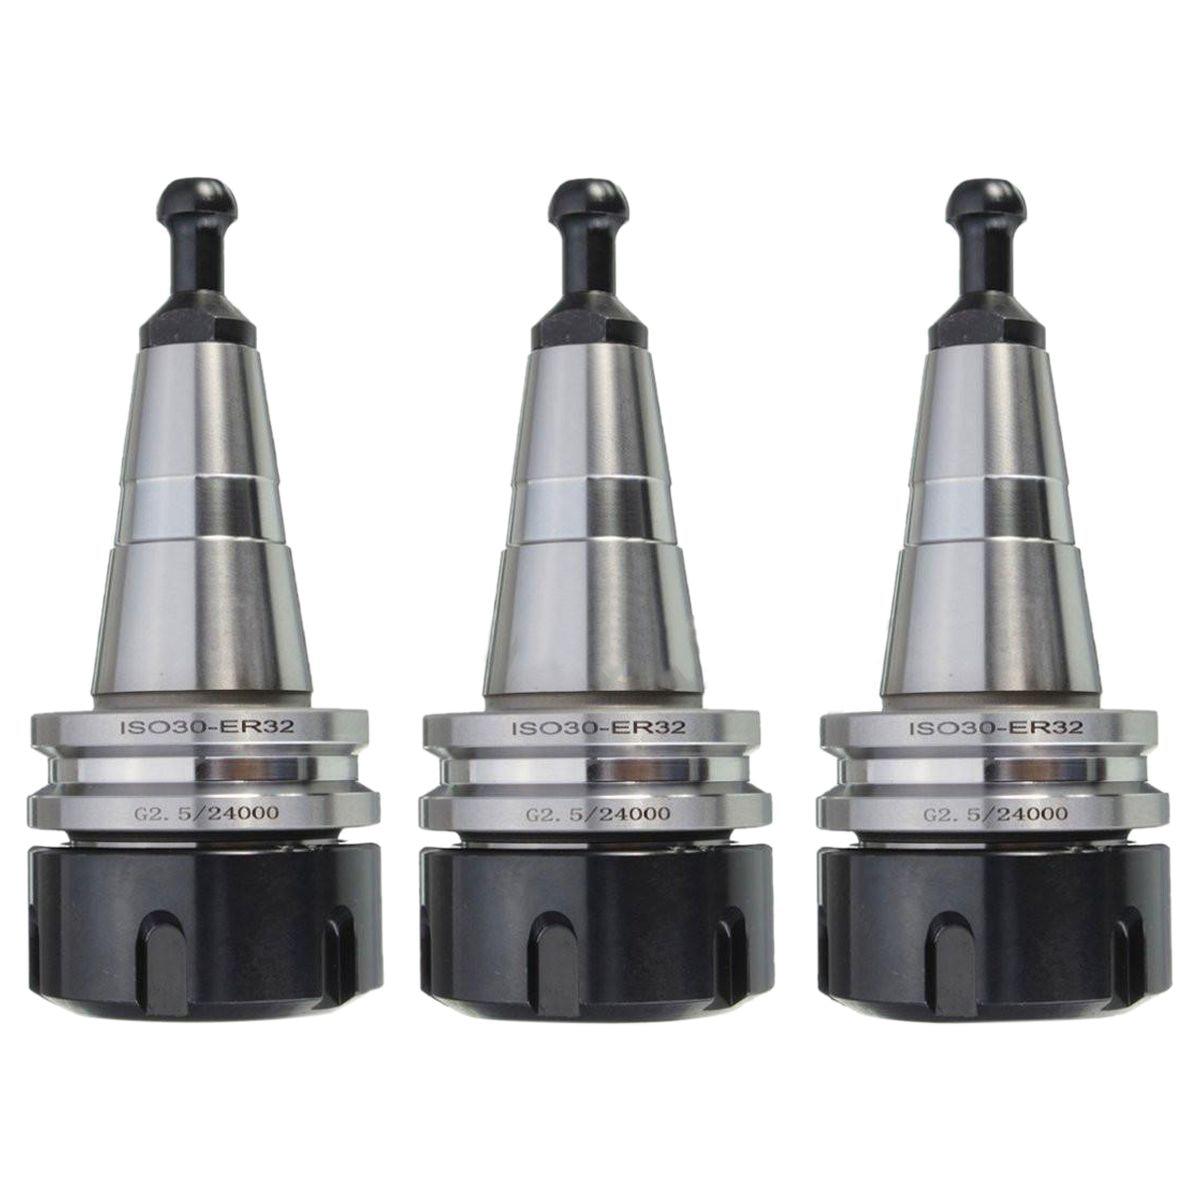 (Drop shipping) 3PCS metal ISO30 ER32 50 Balance Collet Chuck G2.5 24000rpm CNC Toolholder(Drop shipping) 3PCS metal ISO30 ER32 50 Balance Collet Chuck G2.5 24000rpm CNC Toolholder